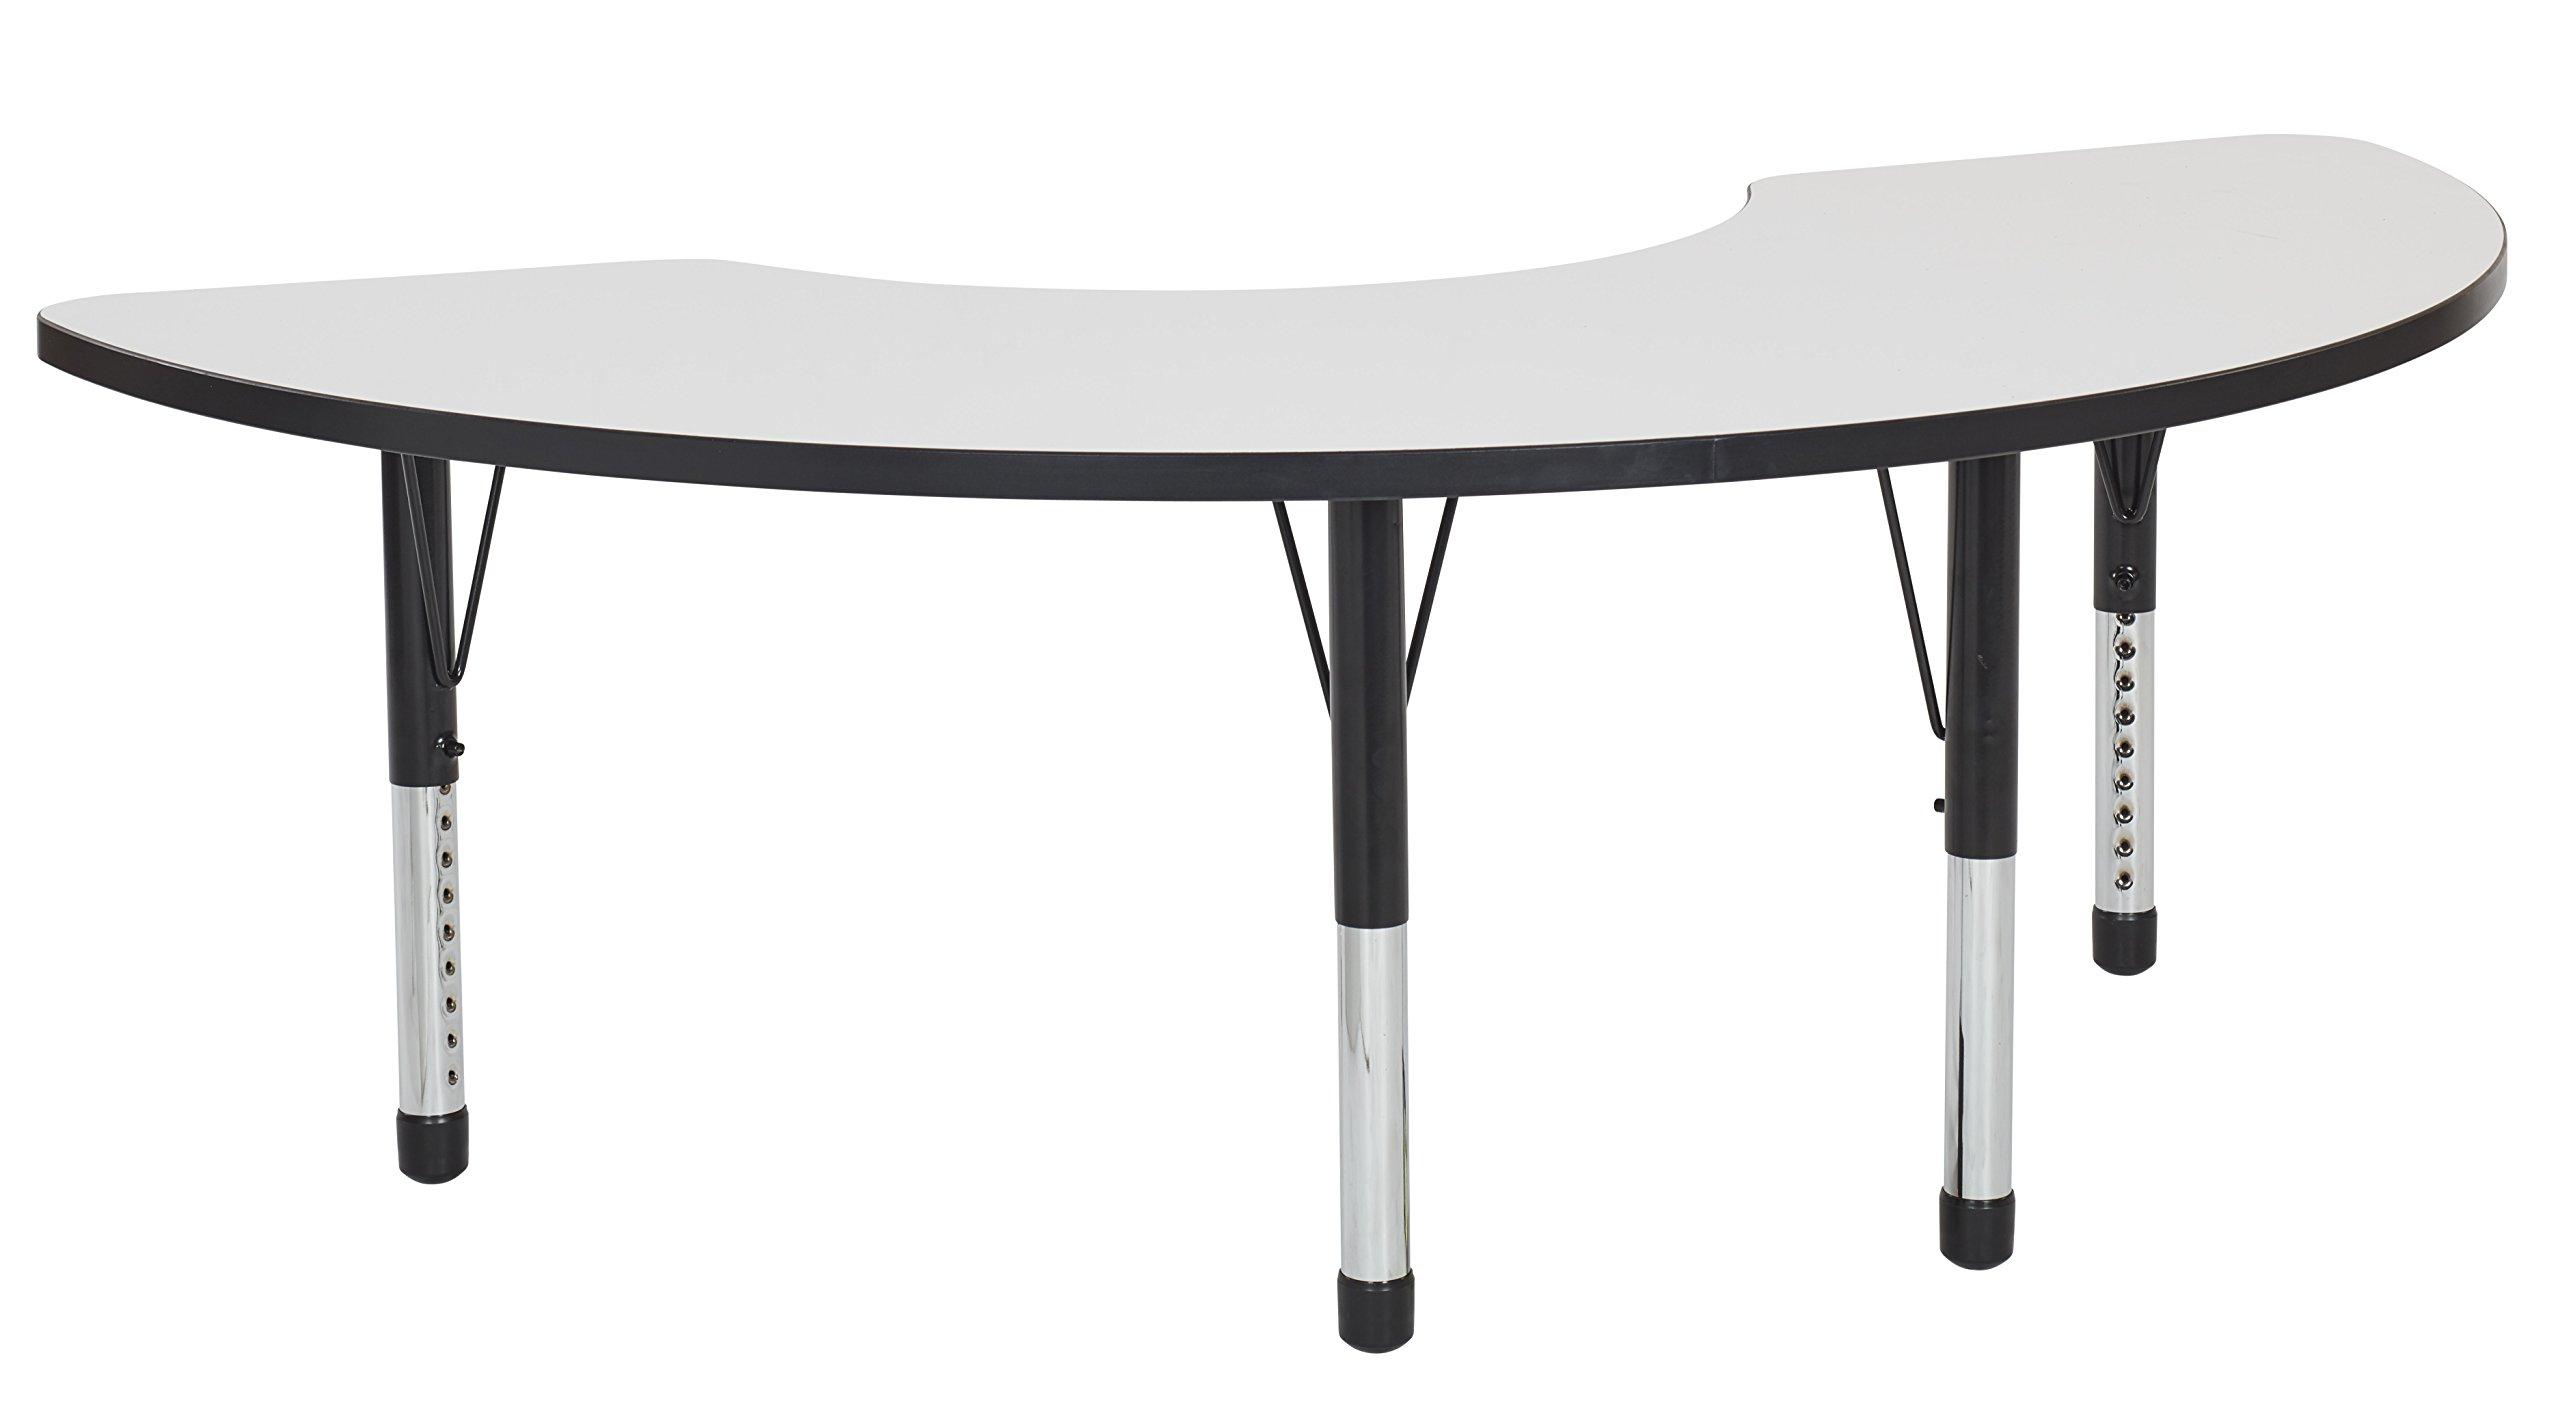 ECR4Kids Dry Erase 36'' x 72'' Half Moon Whiteboard School Activity Table, Chunky Legs, Adjustable Height 15-24 inch (Black)